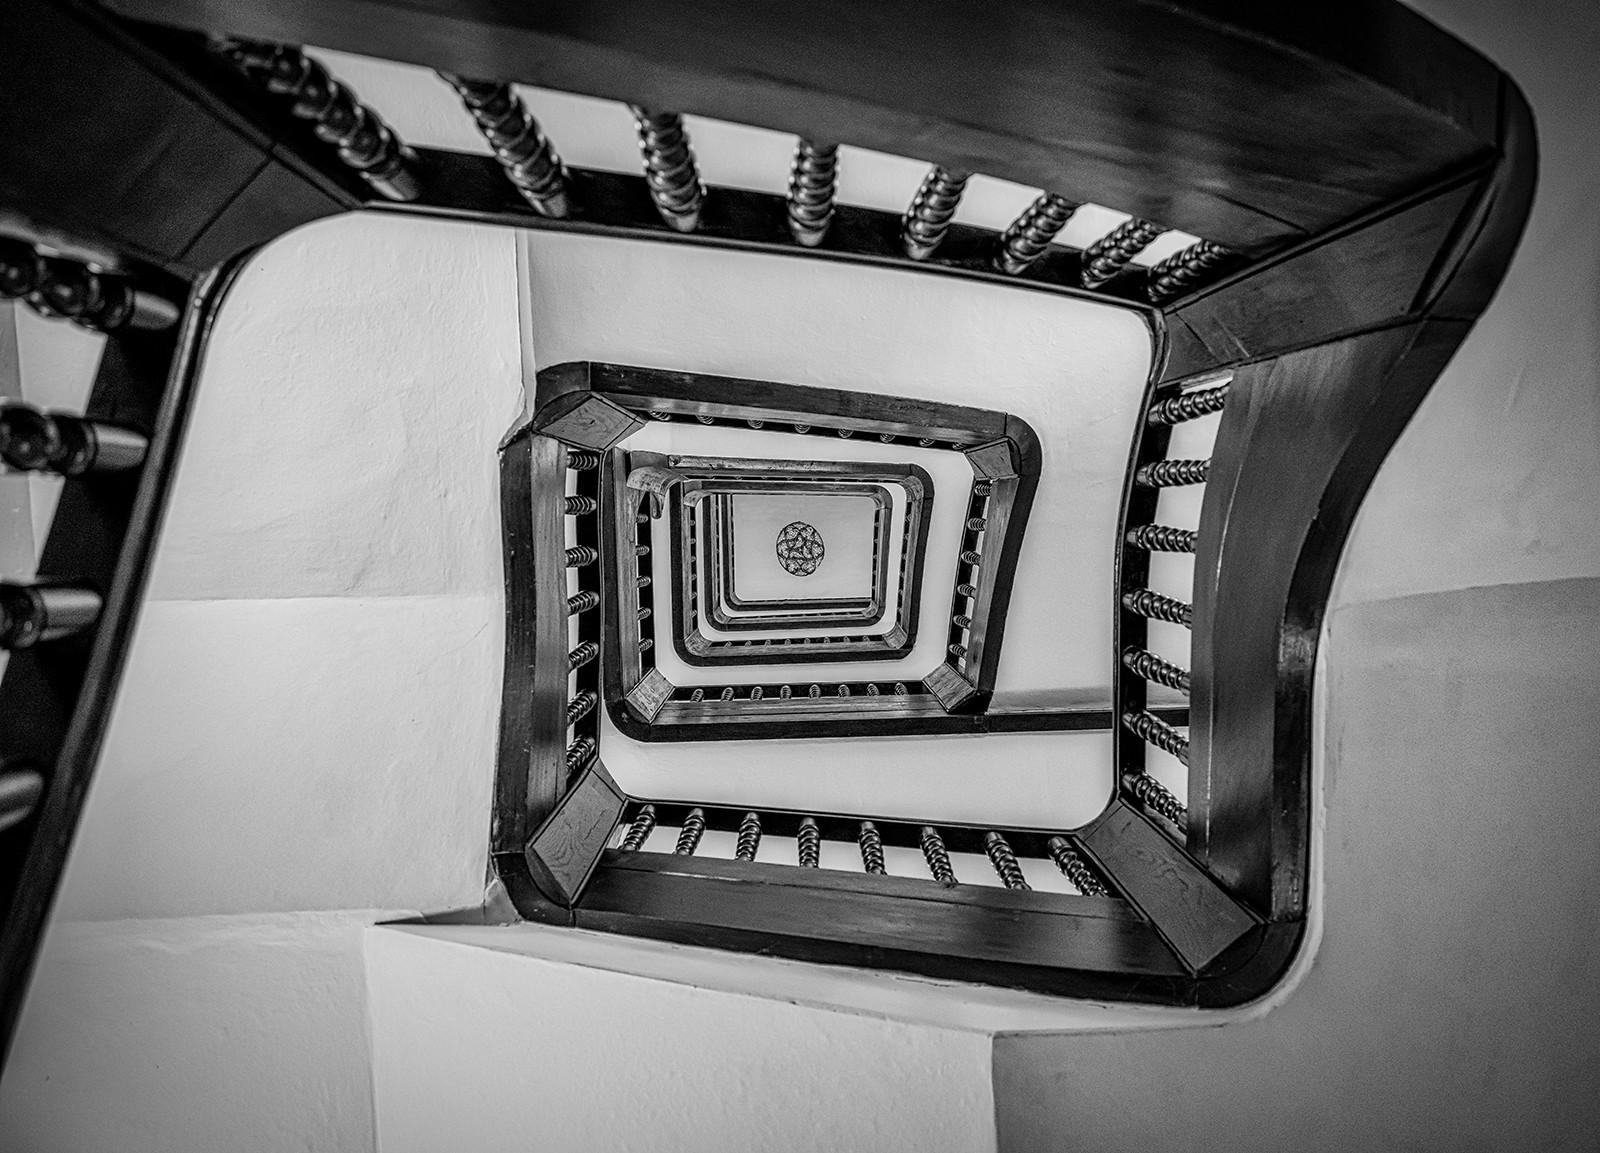 MONO - Ye Olde Spiral Staircase by Steve Haydon (9 marks)